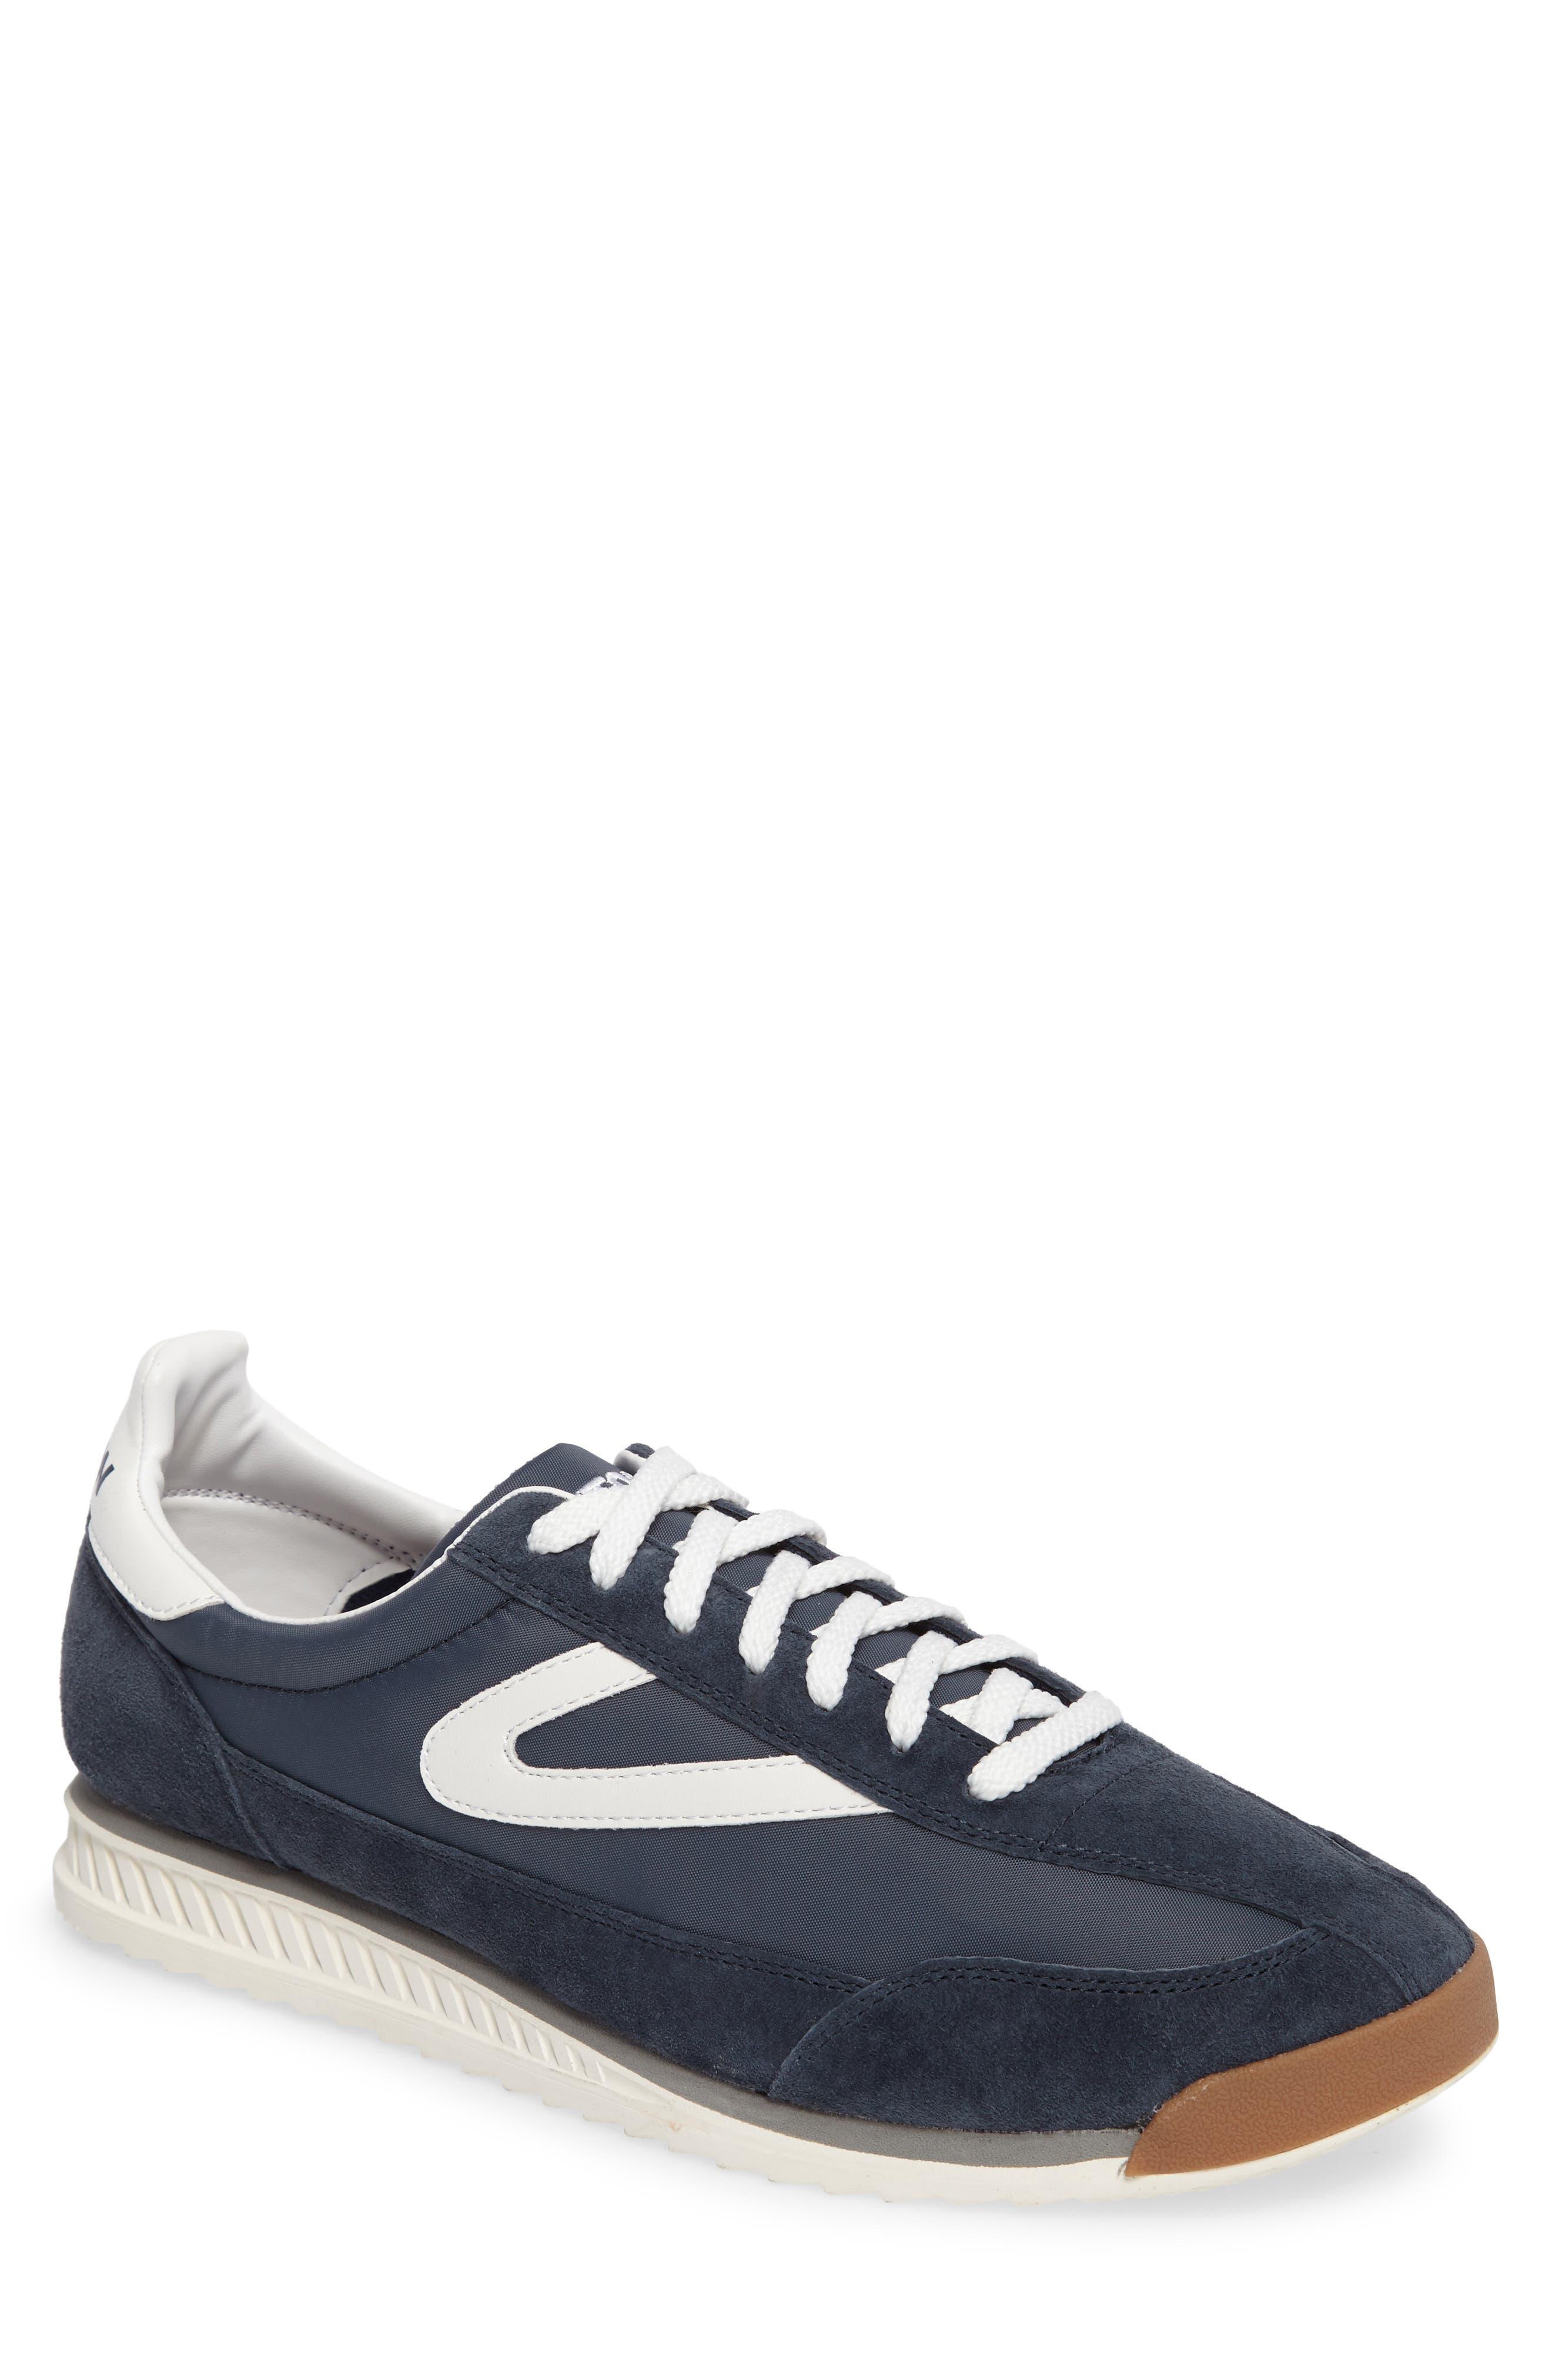 Rawlins 3 Sneaker,                         Main,                         color, Blue/ Blue/ White